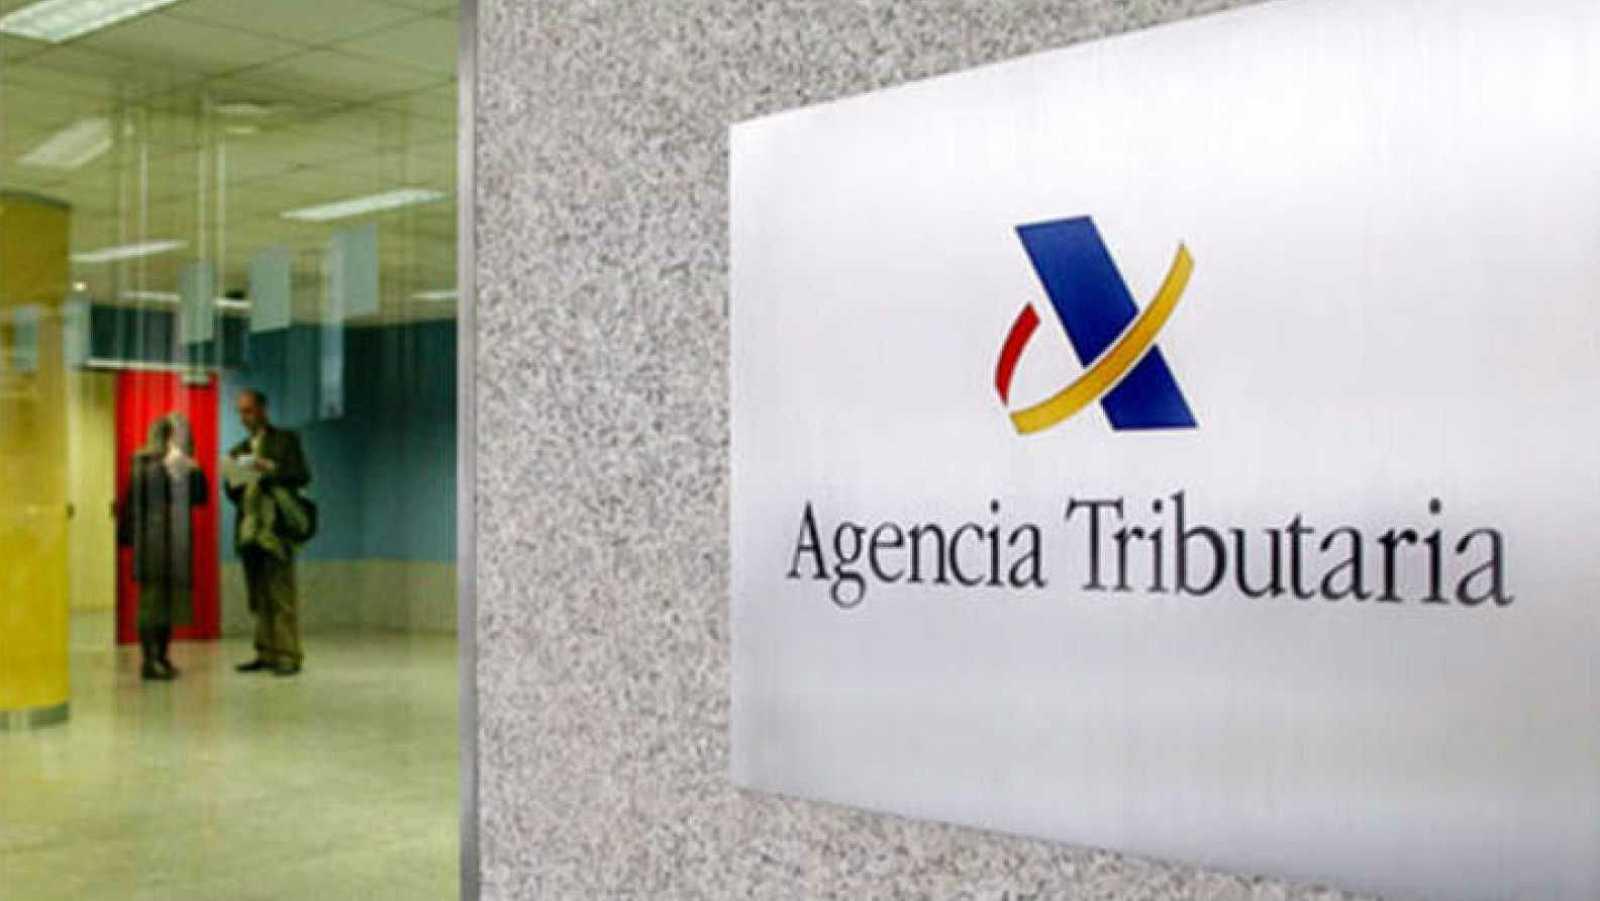 Logotipo de la Agencia Tributaria.